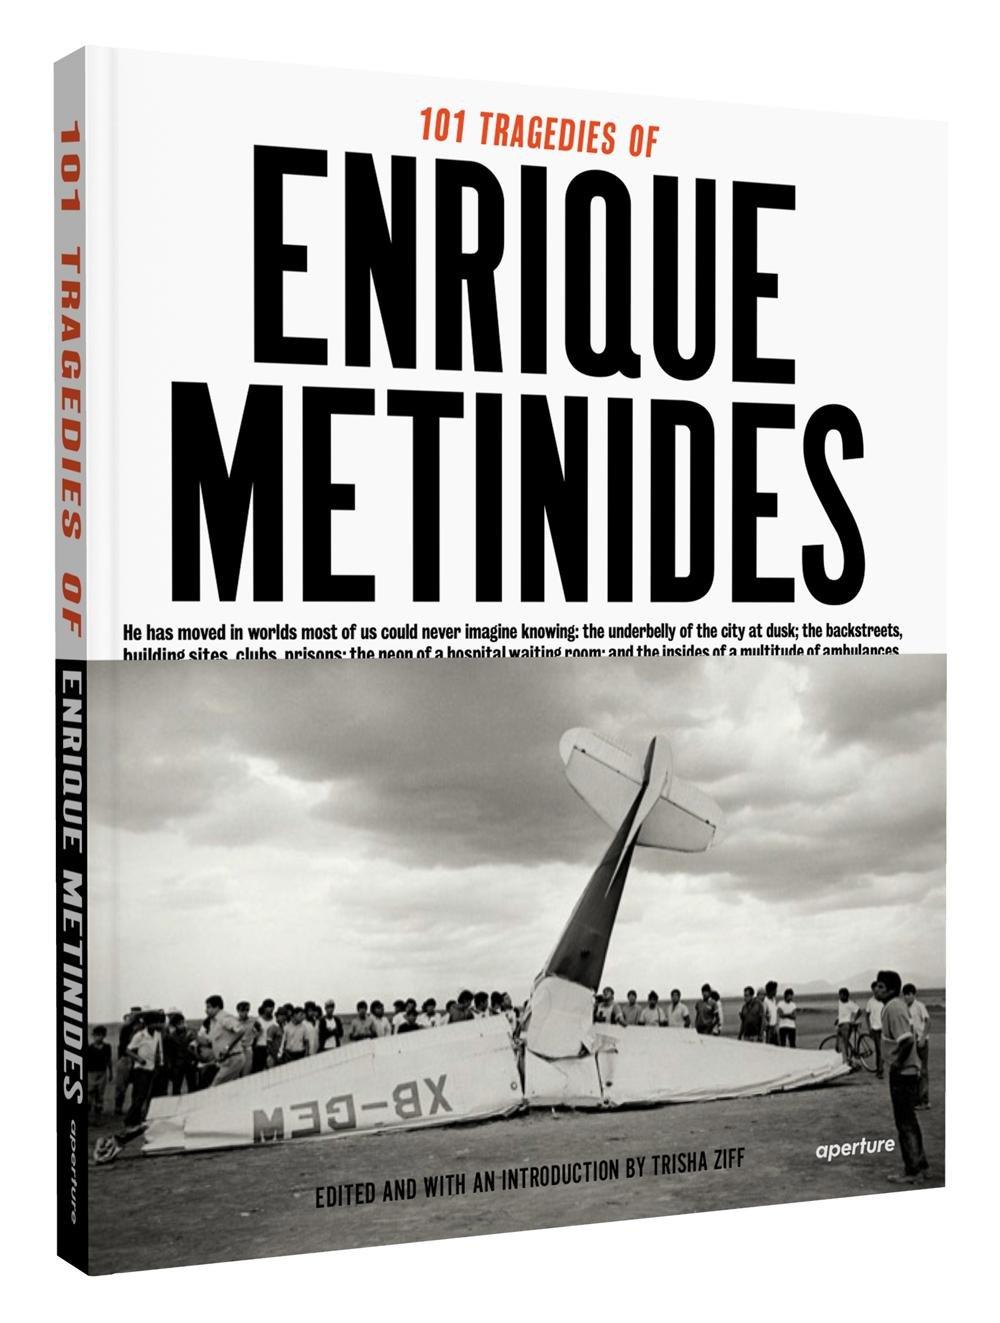 101 Tragedies of Enrique Metinides: Trisha Ziff, Enrique Metinides: 9781597112116: Amazon.com: Books